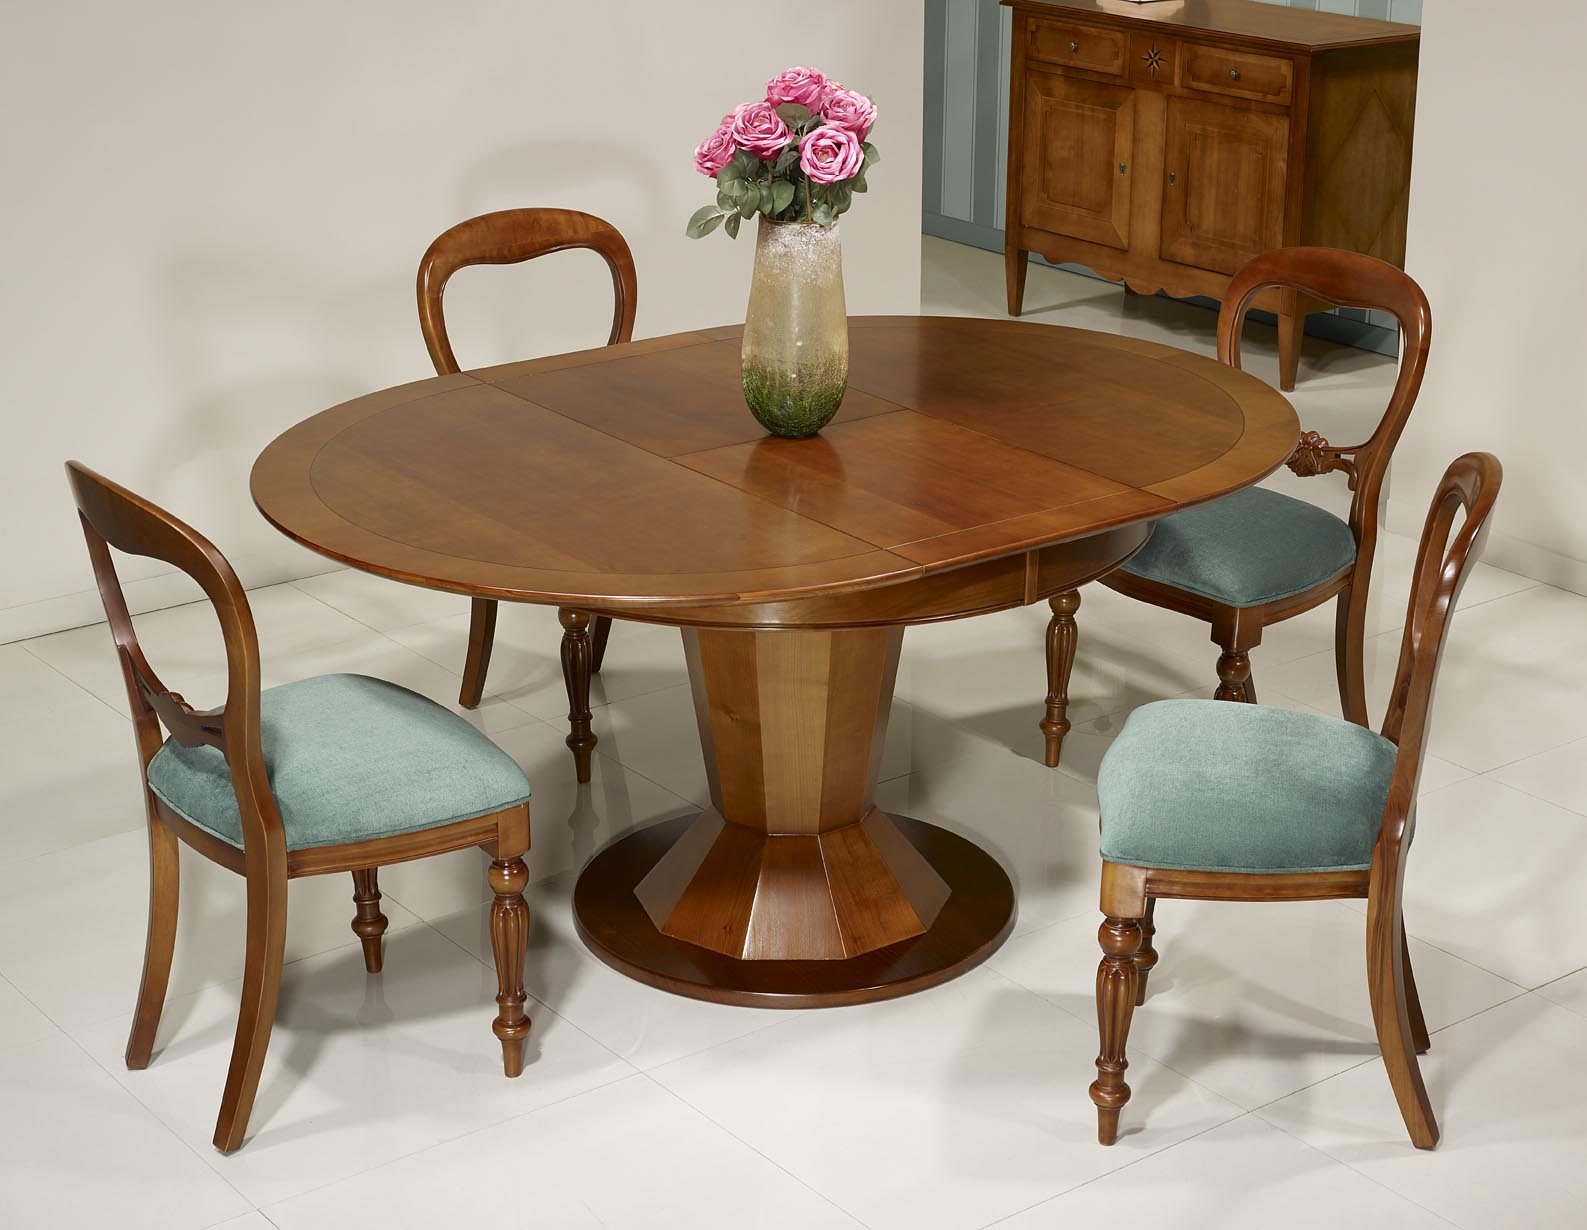 Table ronde pied central en merisier de style contemporain modele unique meuble en merisier - Pied de table ronde ...